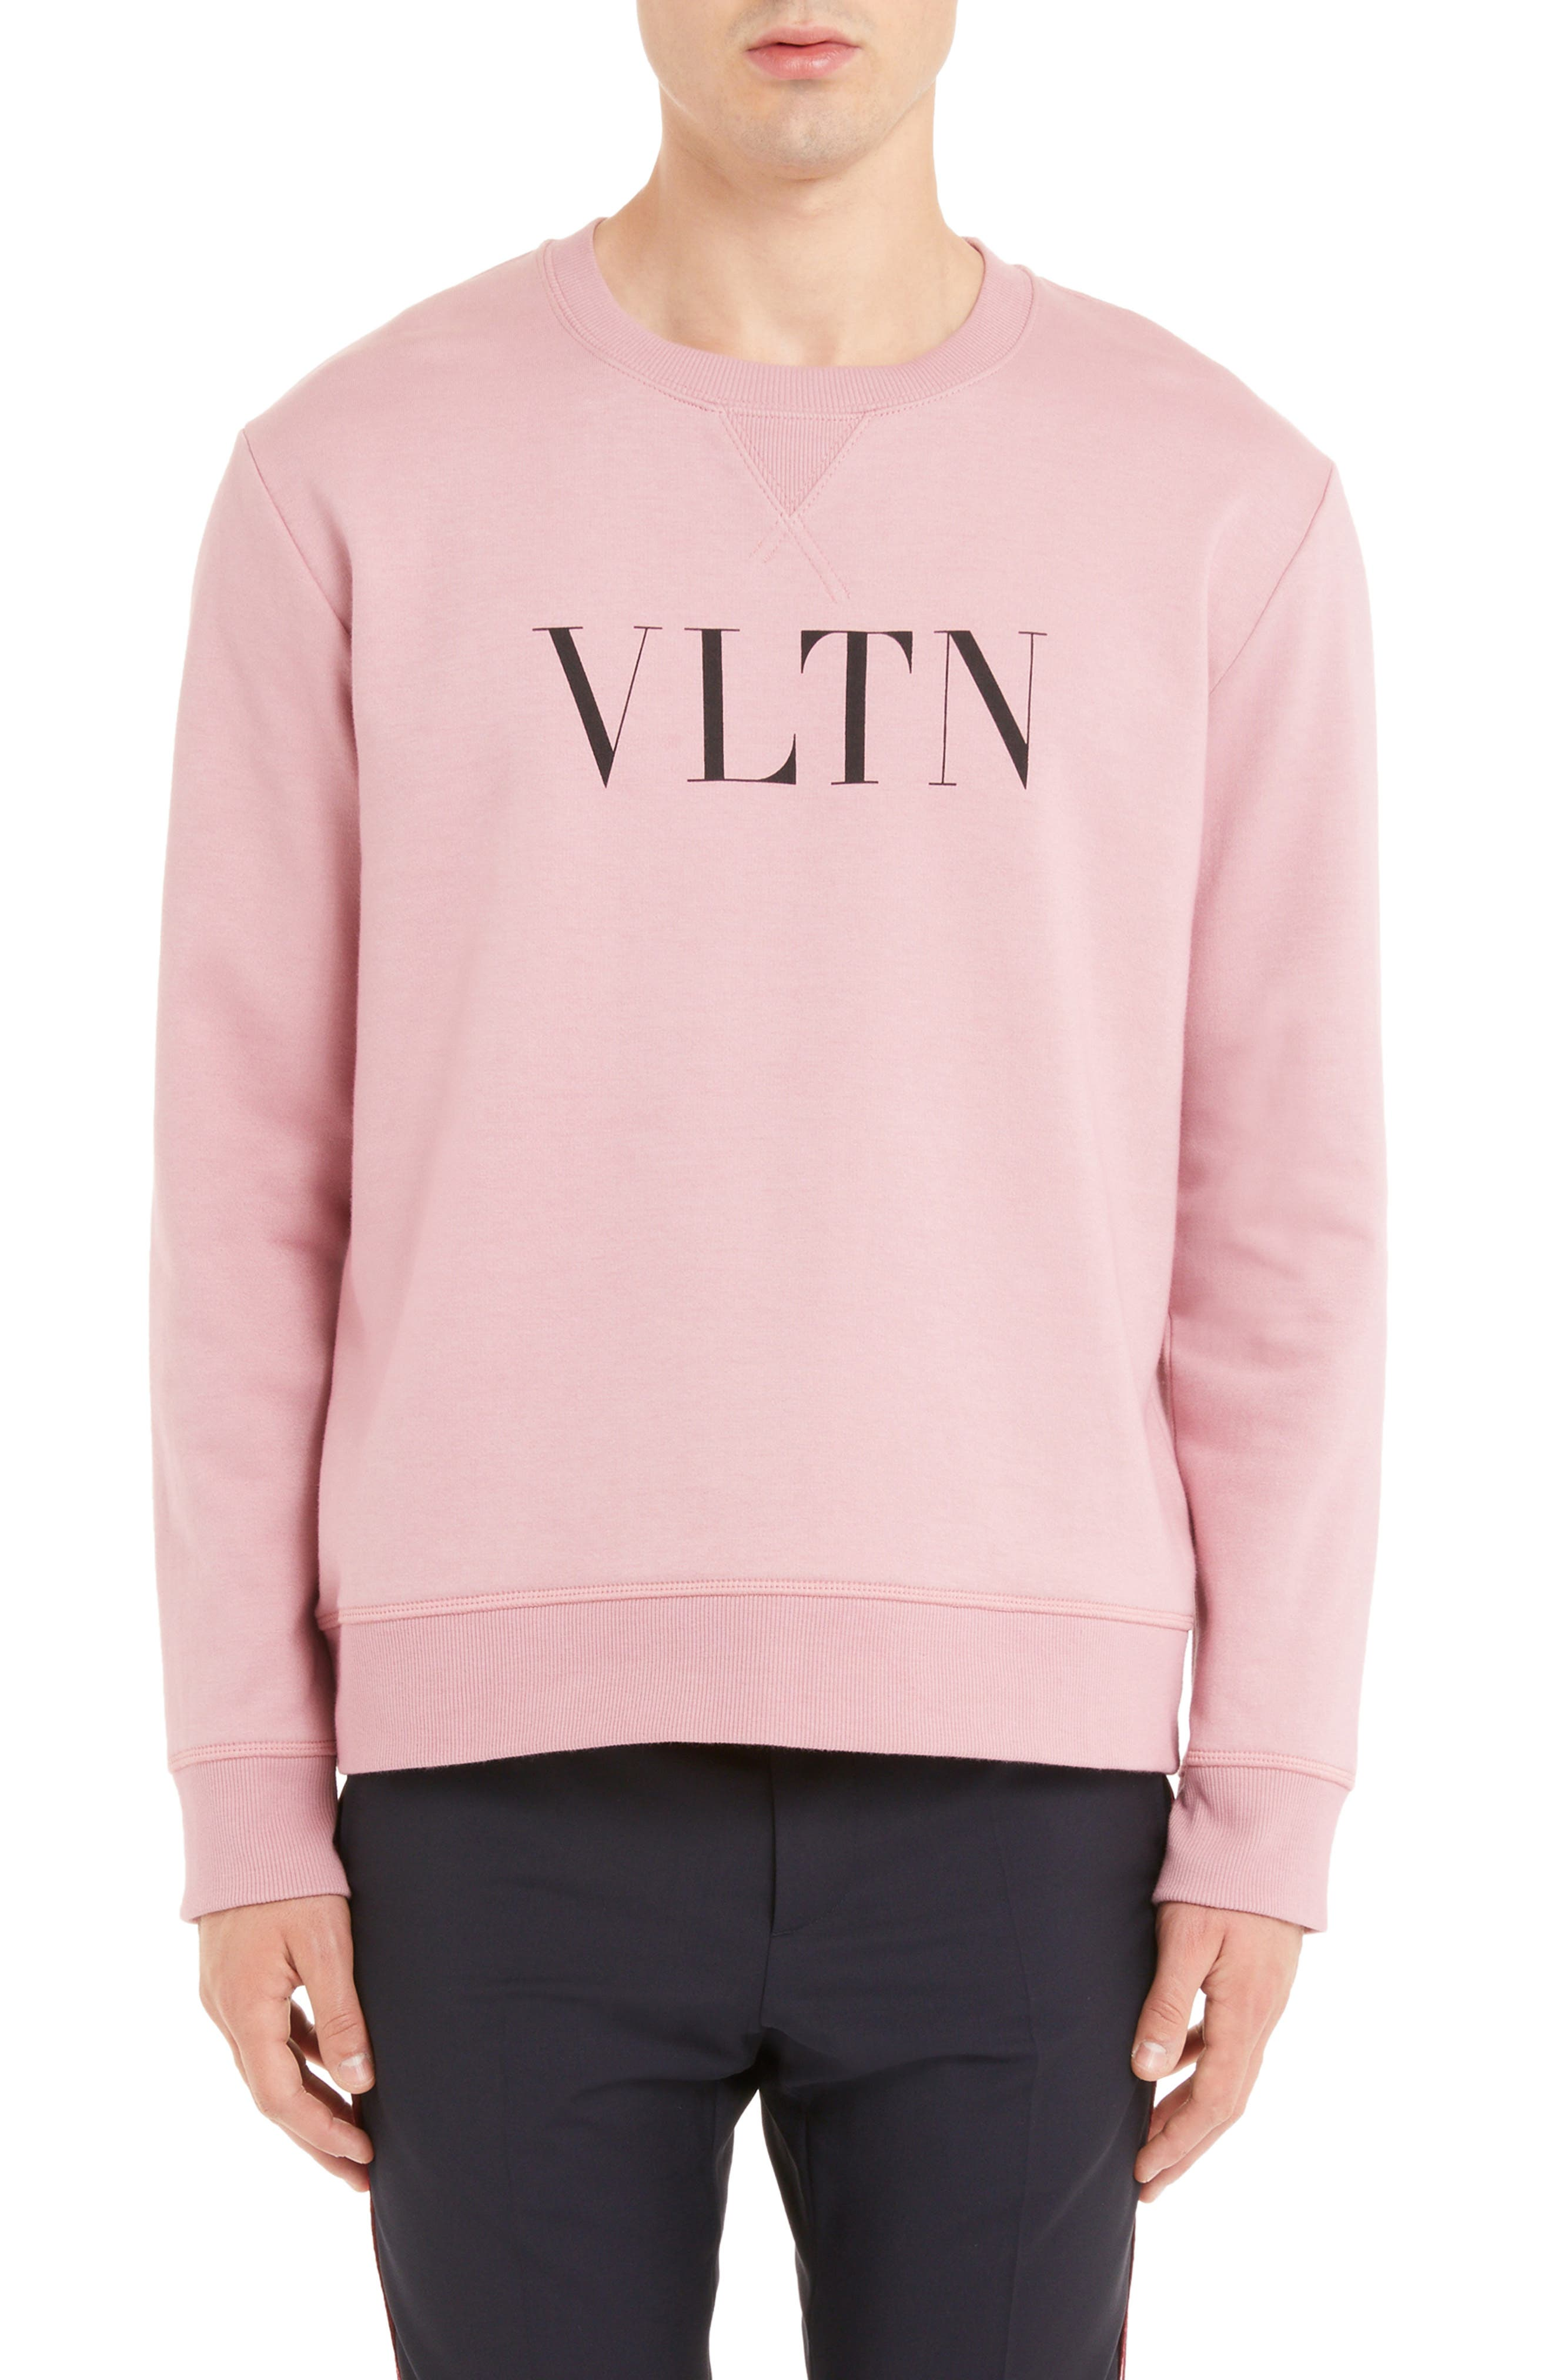 VLTN Logo Sweatshirt,                             Main thumbnail 1, color,                             ROSA